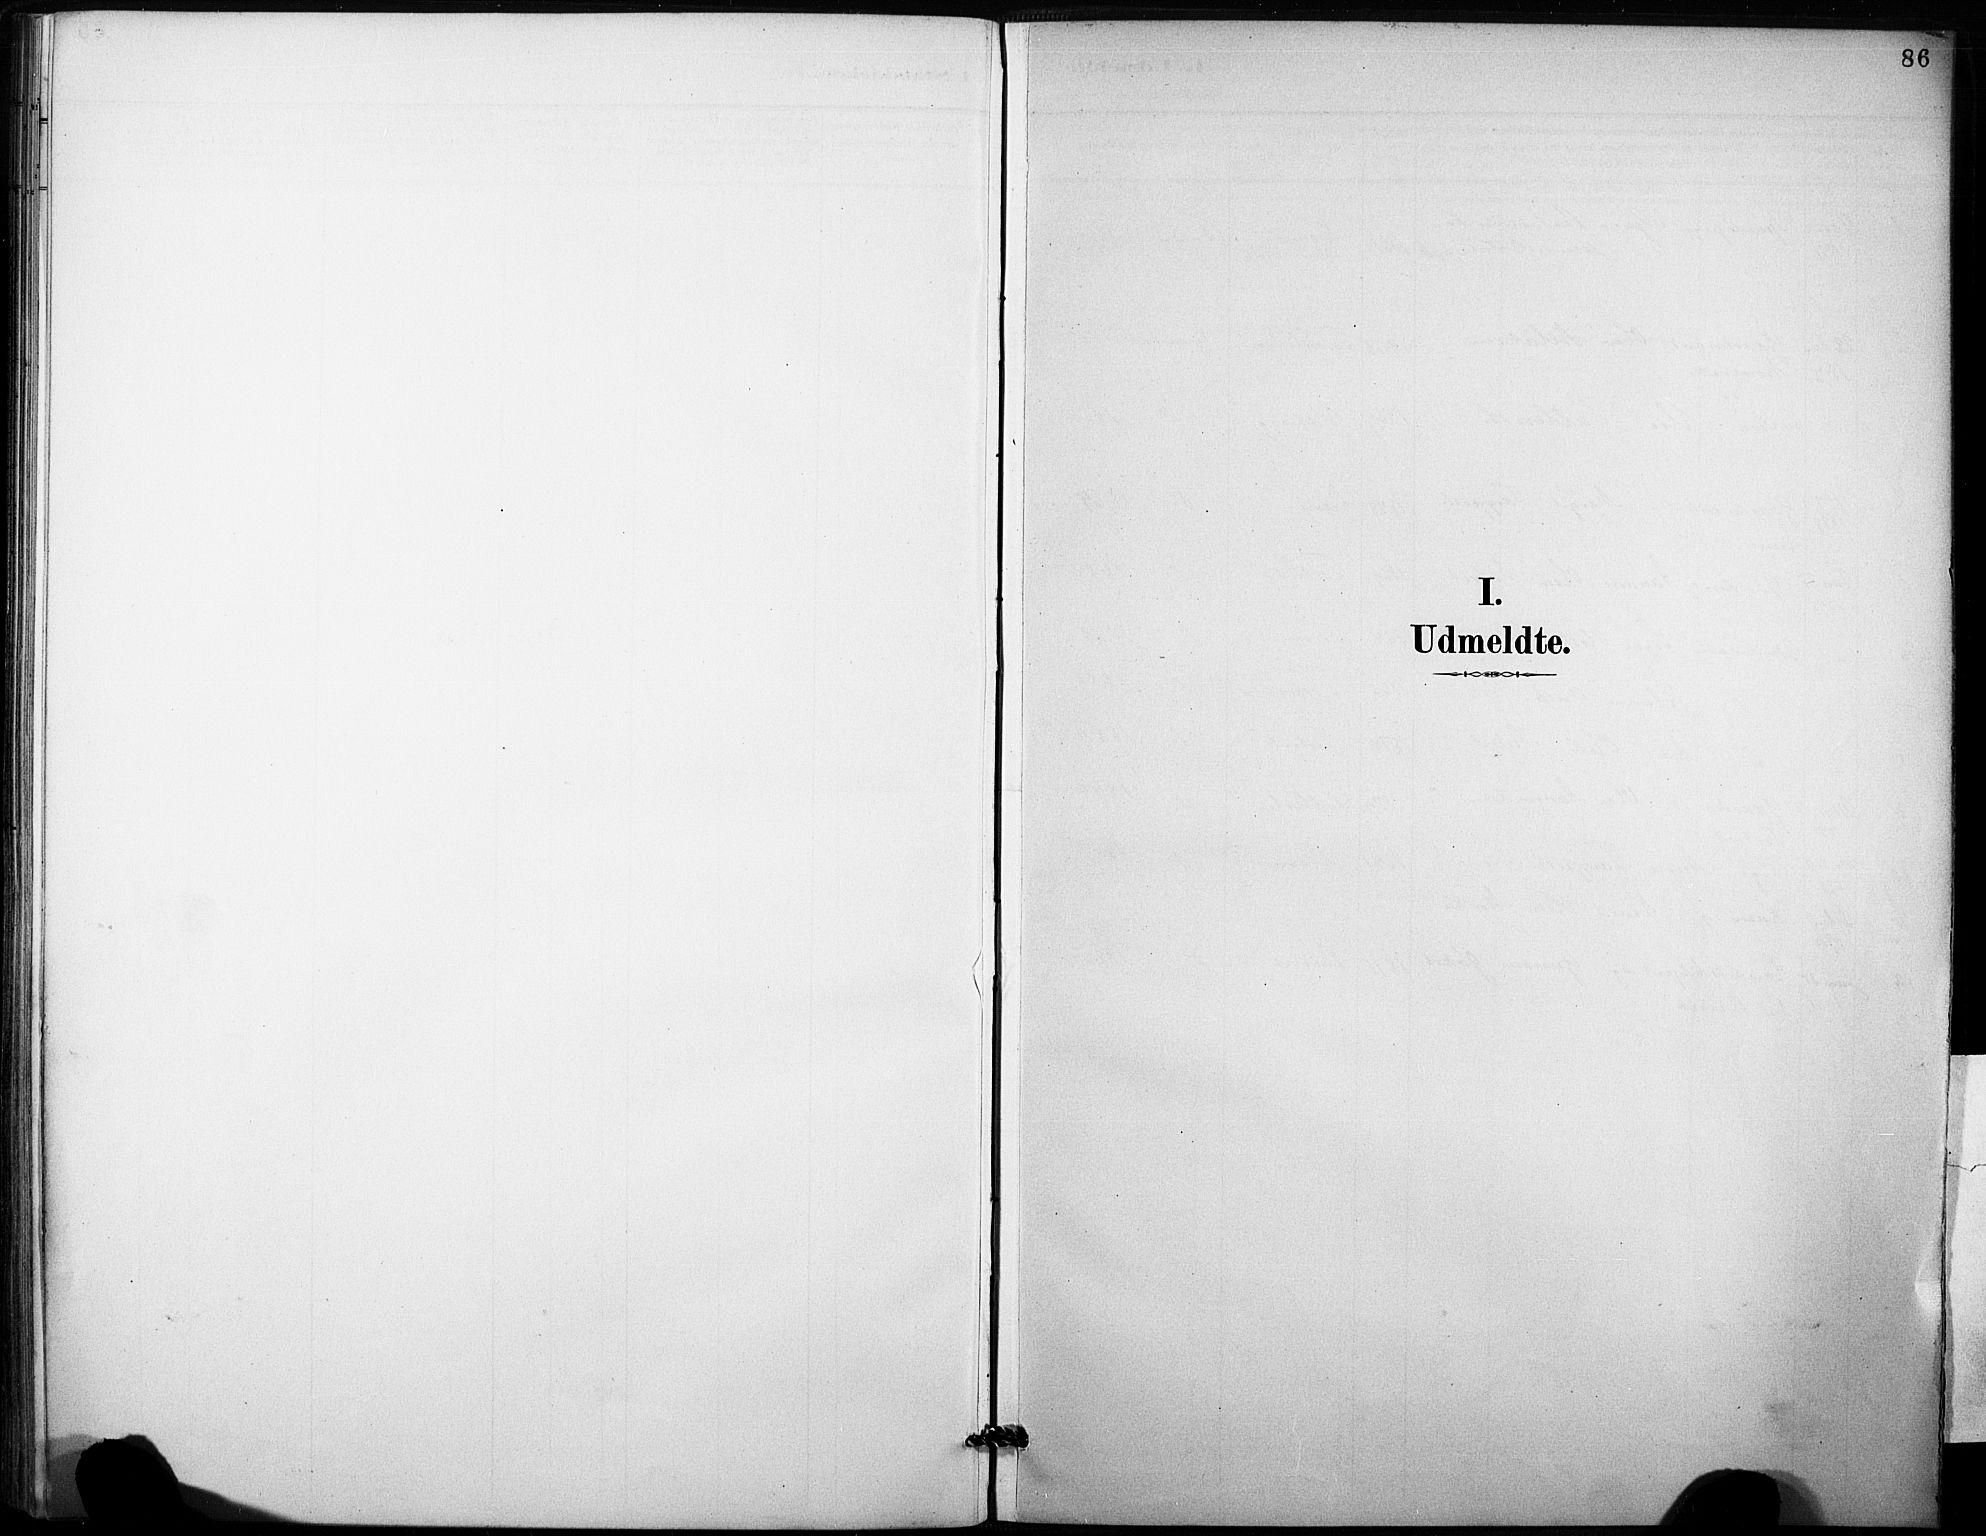 SAKO, Fyresdal kirkebøker, F/Fb/L0003: Ministerialbok nr. II 3, 1887-1903, s. 86